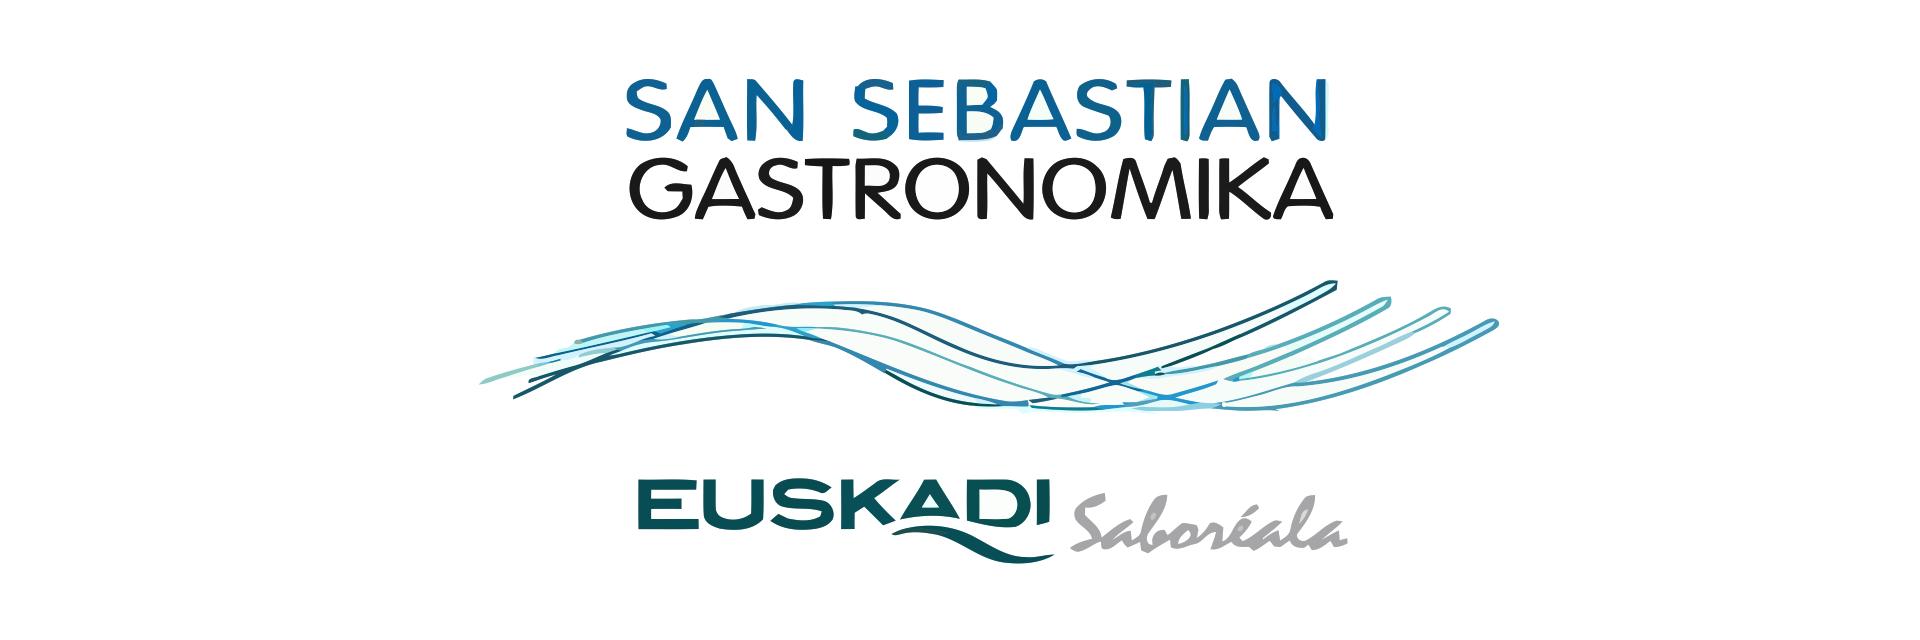 San-Sebastián-Gastronomia_vectorized